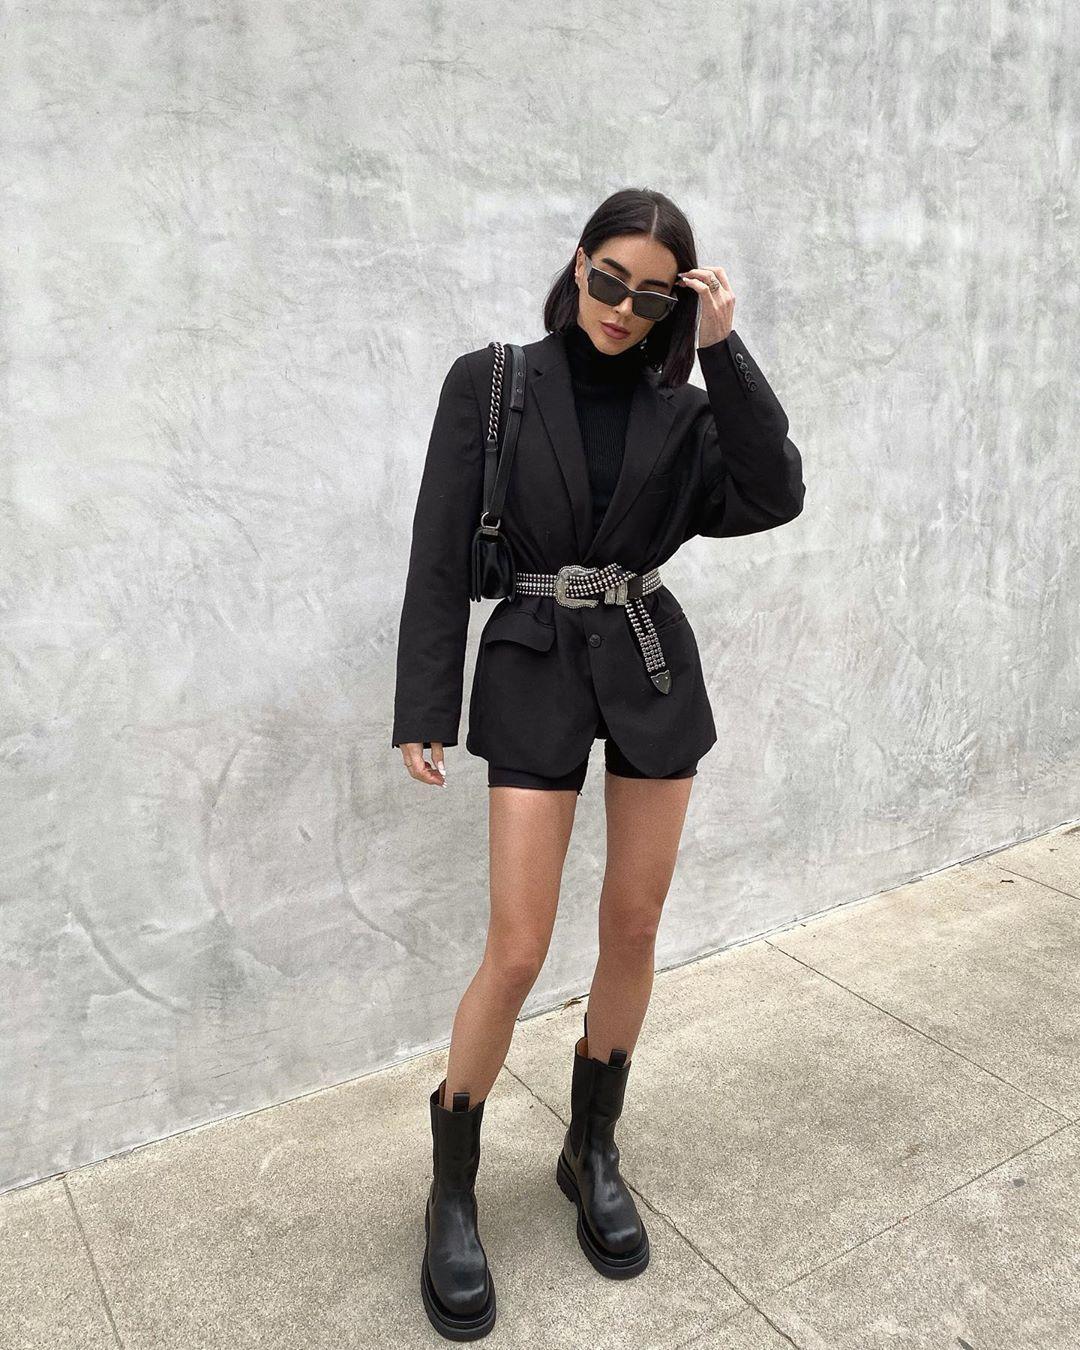 Te presentamos a la fashion blogger Brittany Xavier